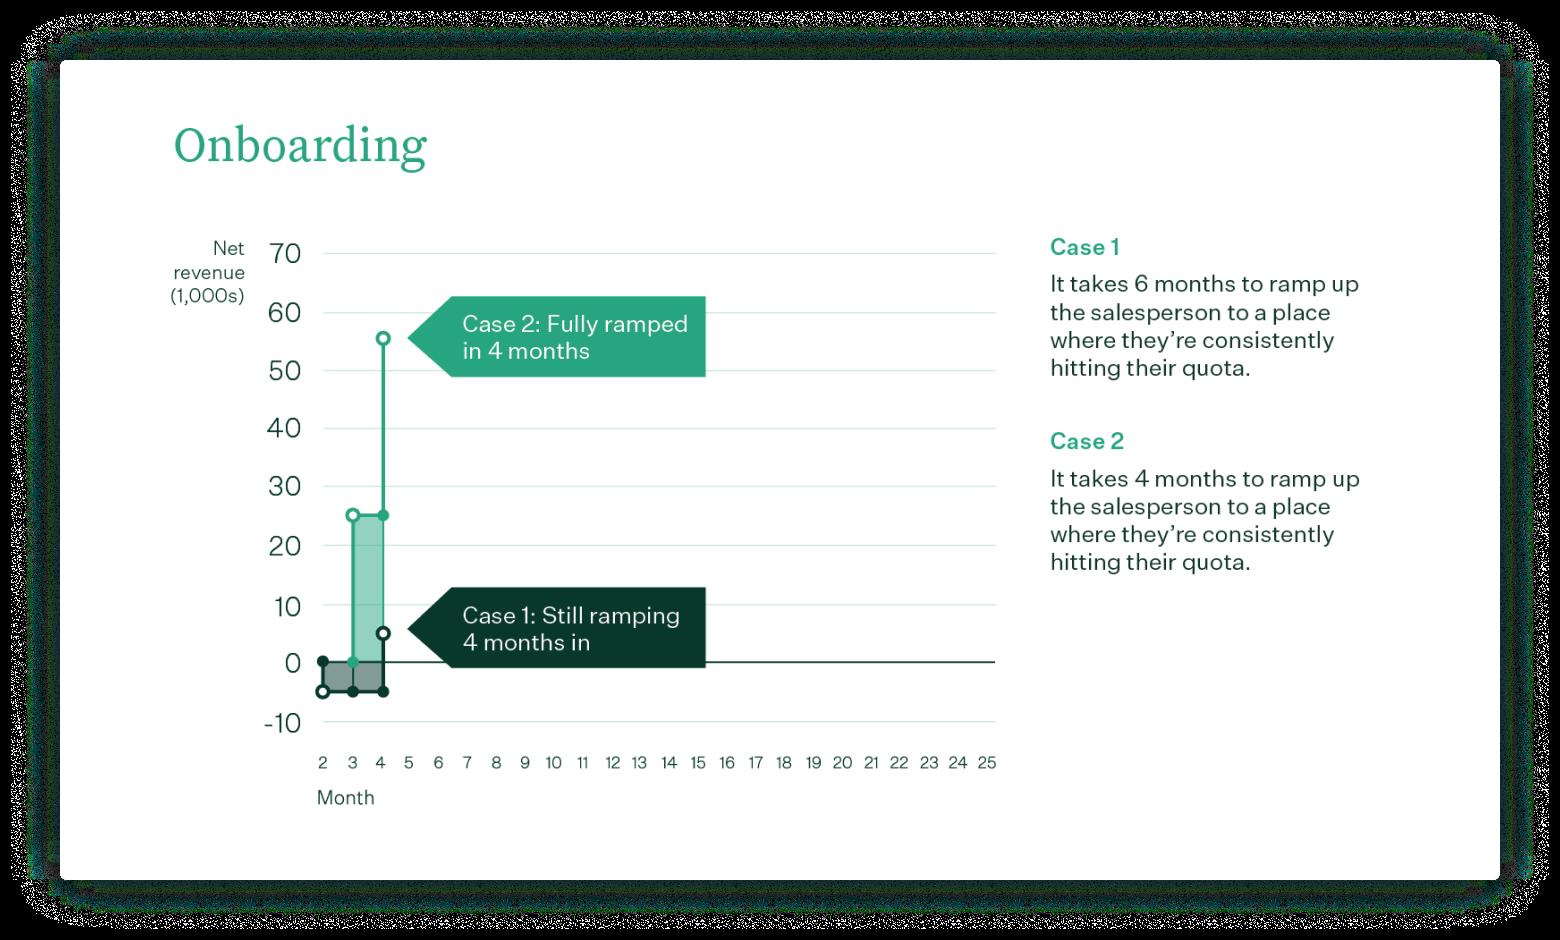 ELTV Onboarding Case comparisons chart